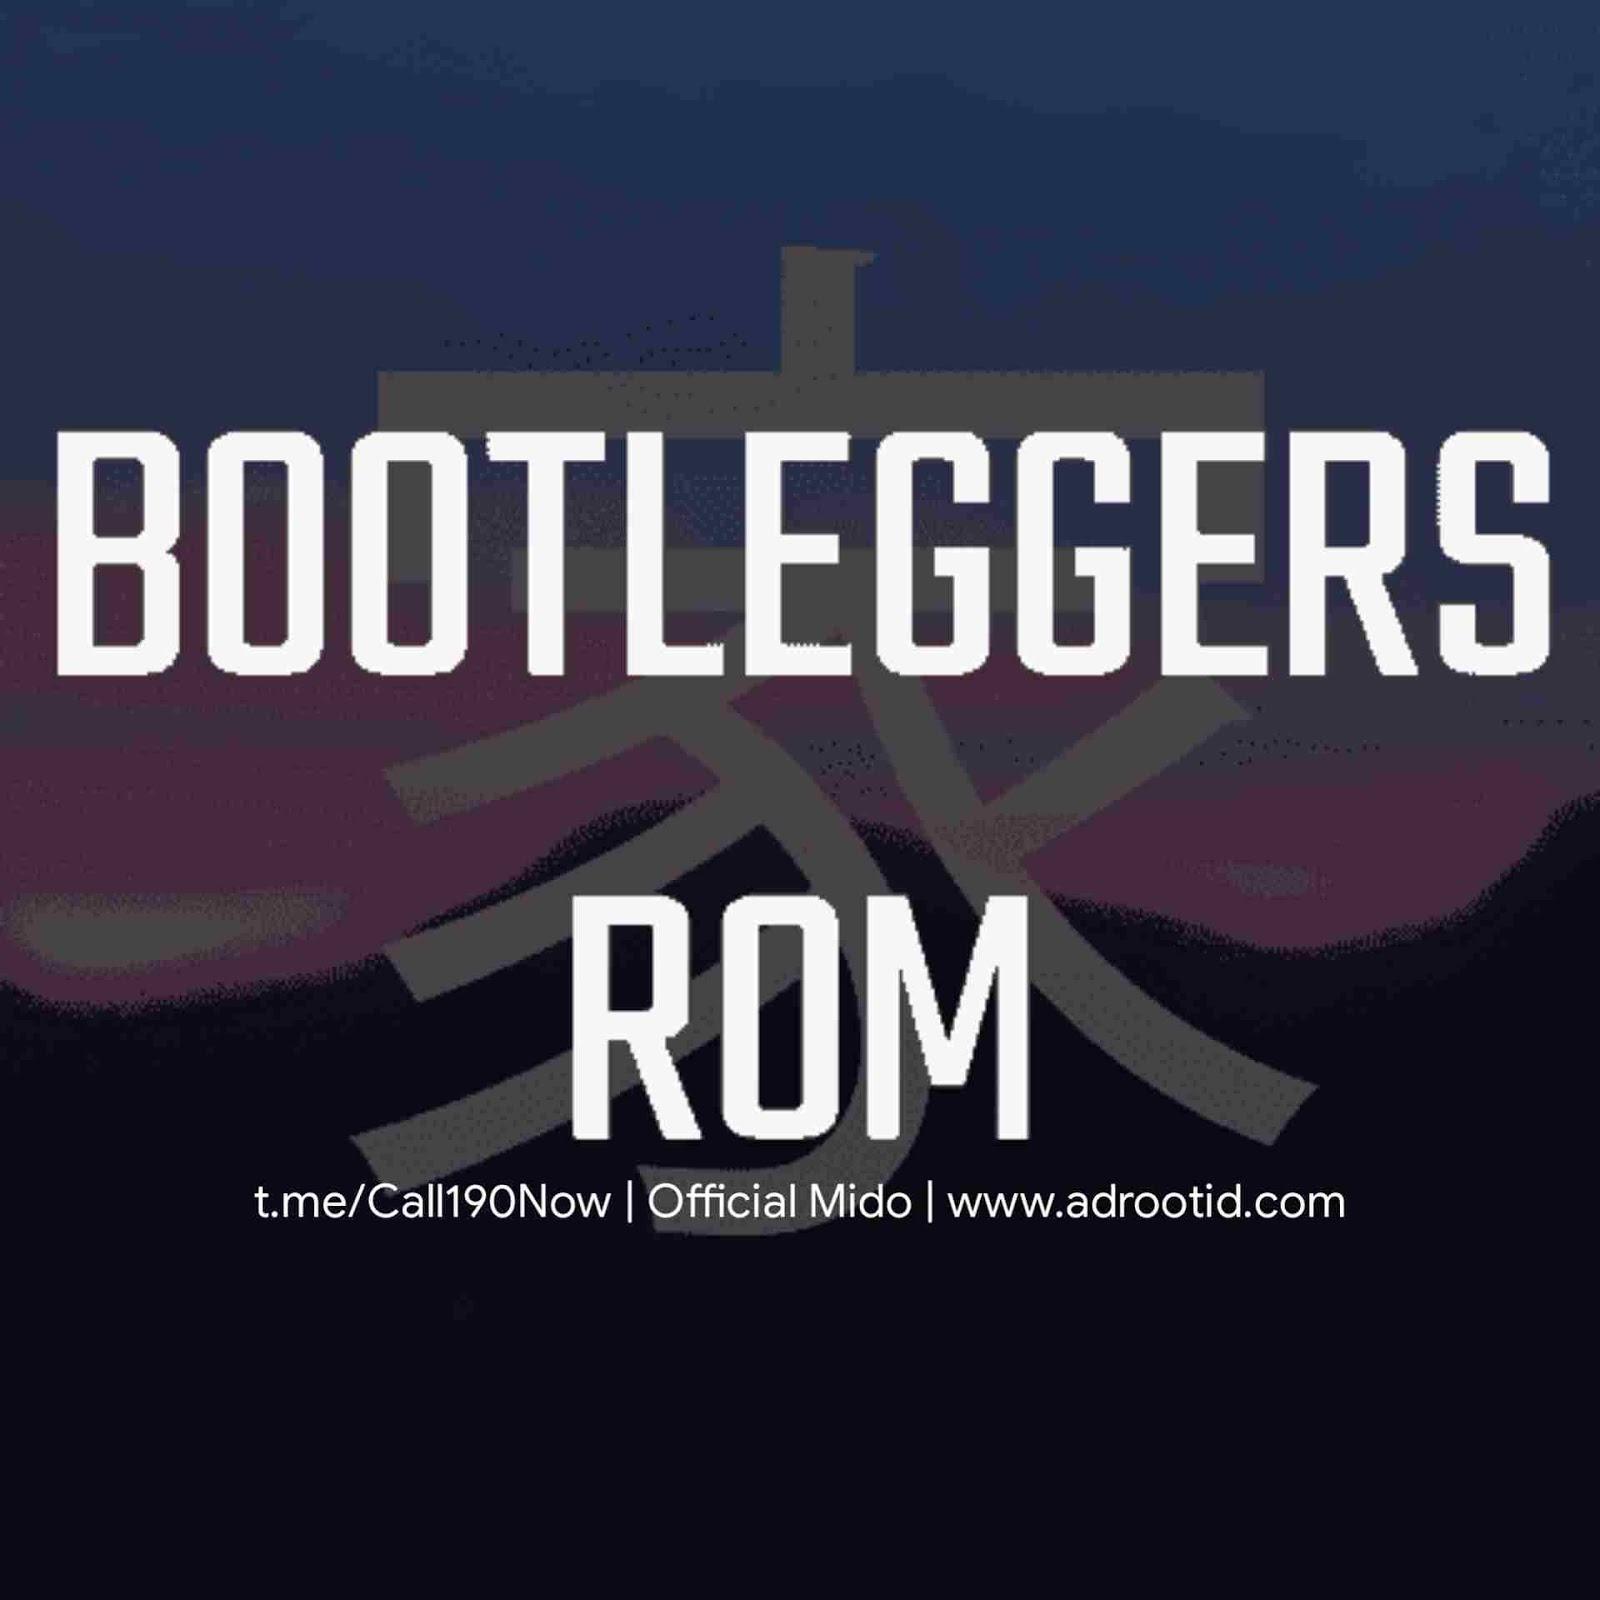 Bootleggers redmi note 4